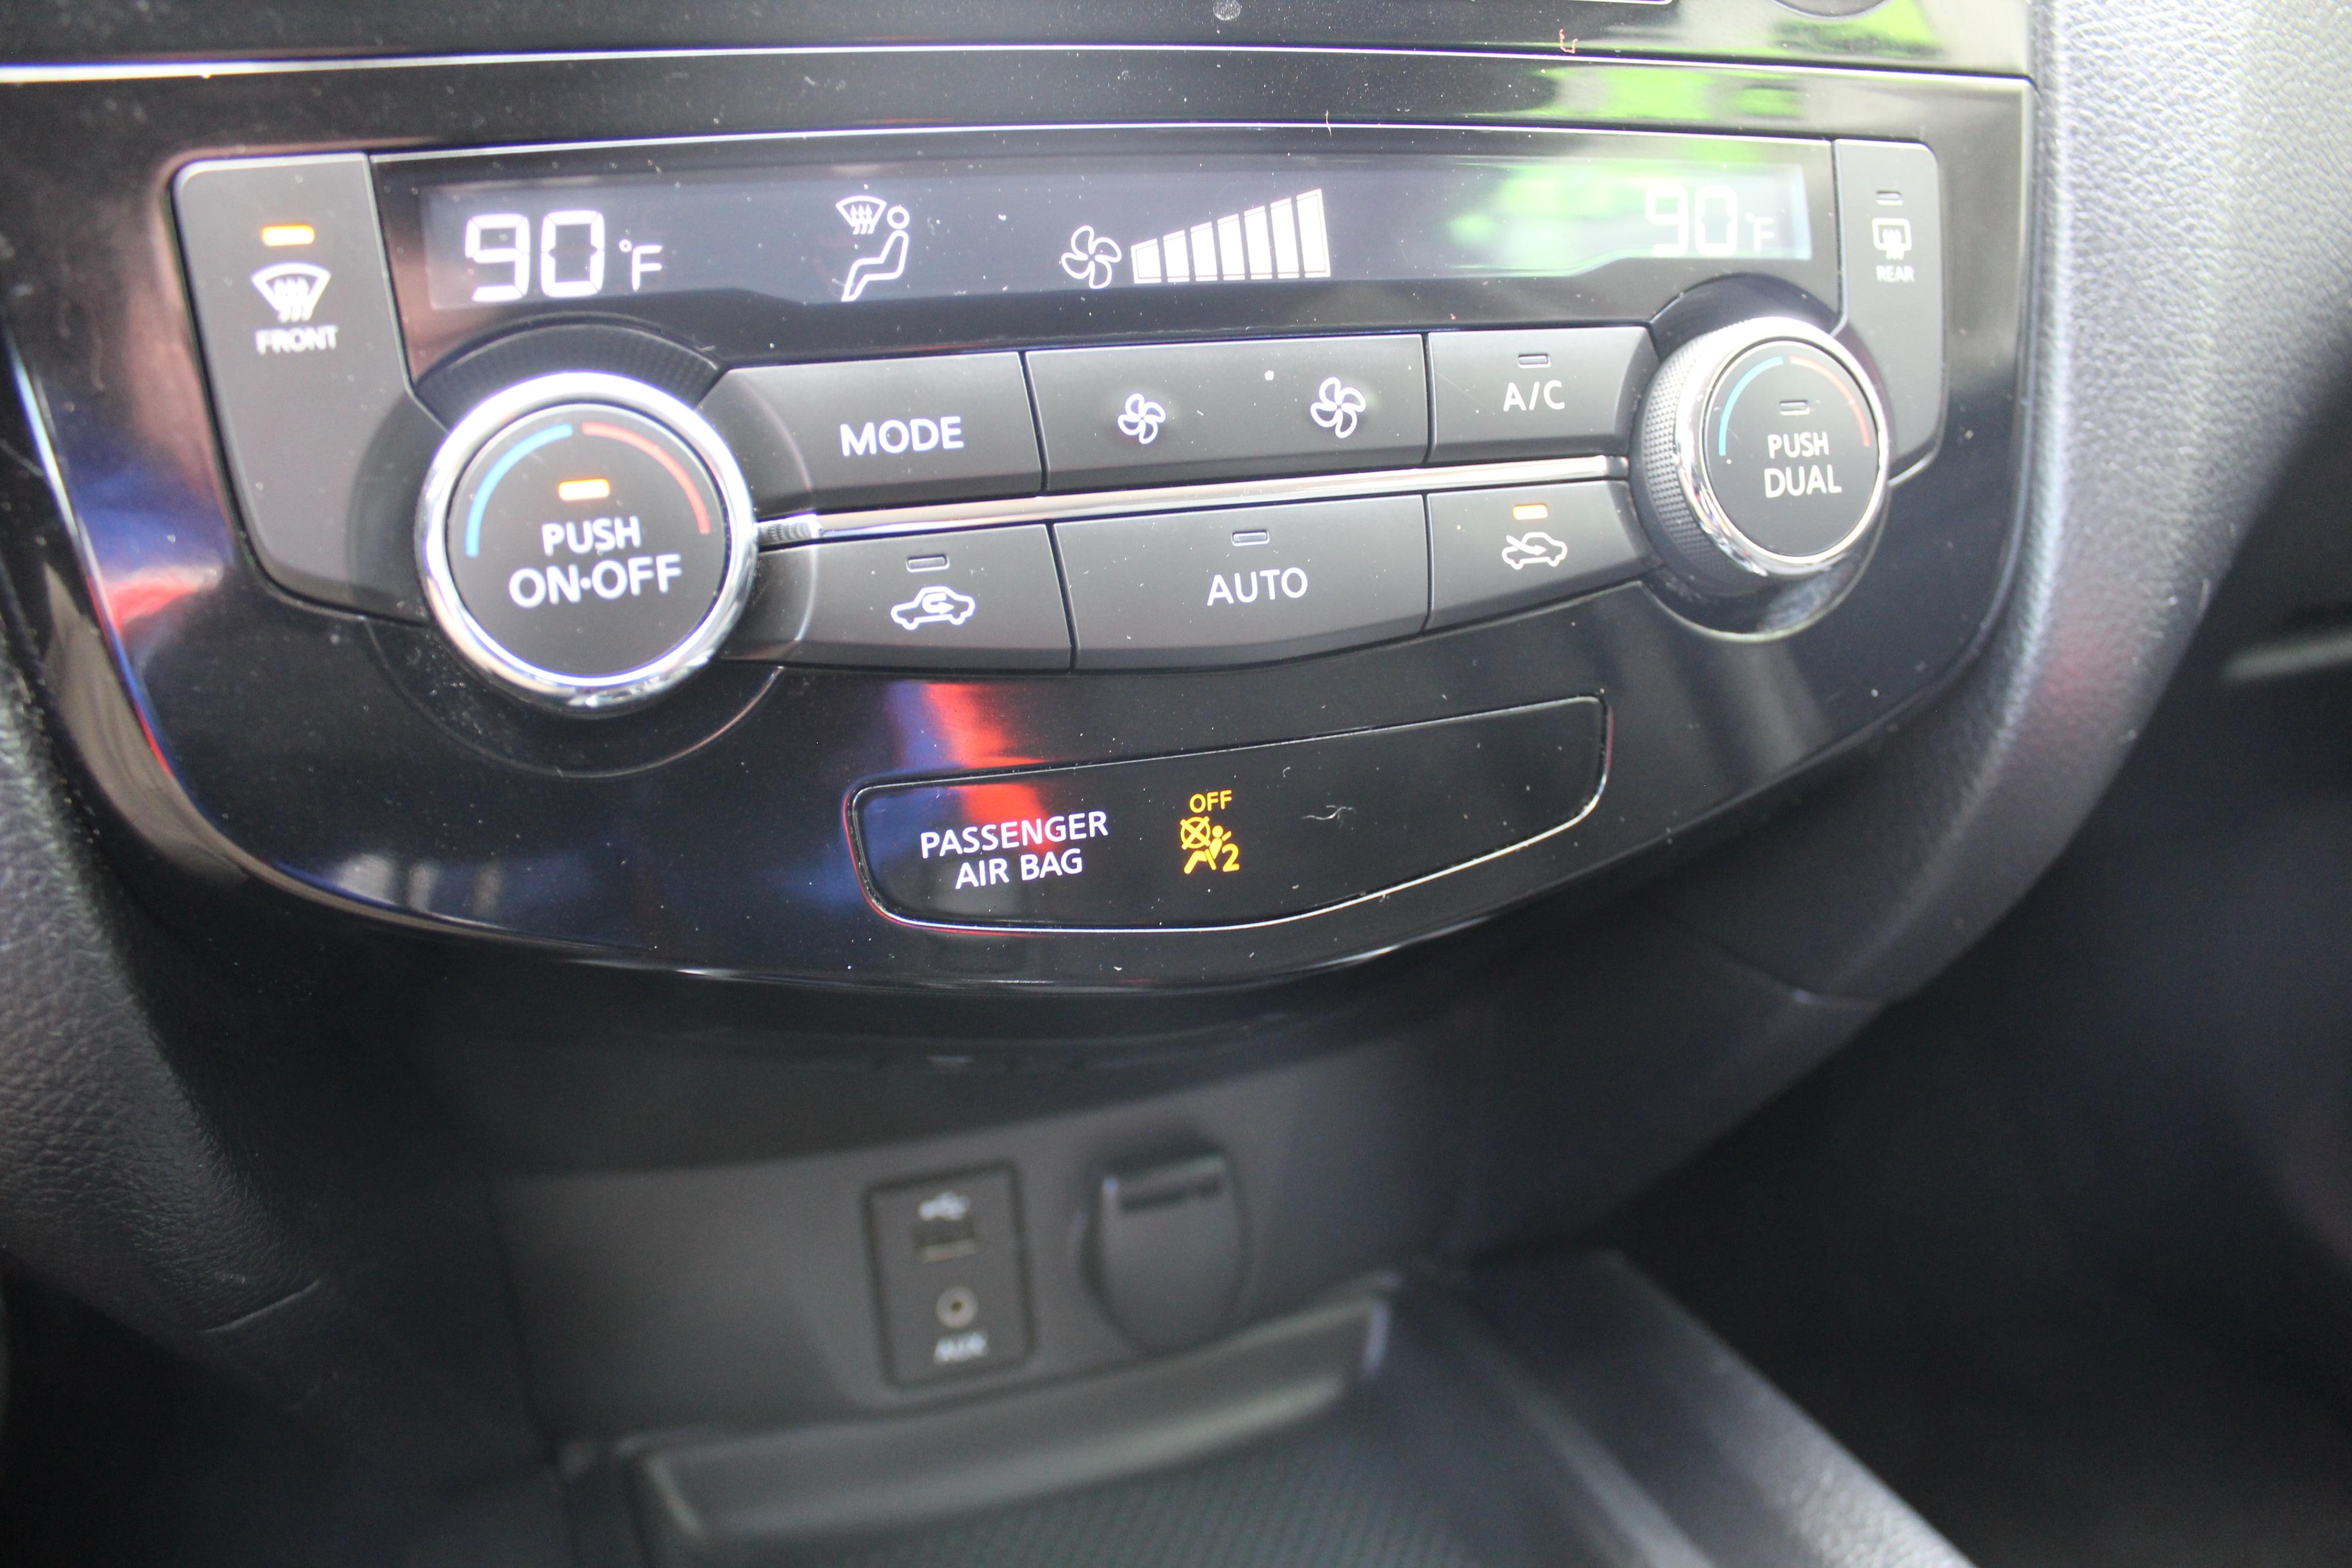 2015 Nissan Rogue Wagon 4 Dr.